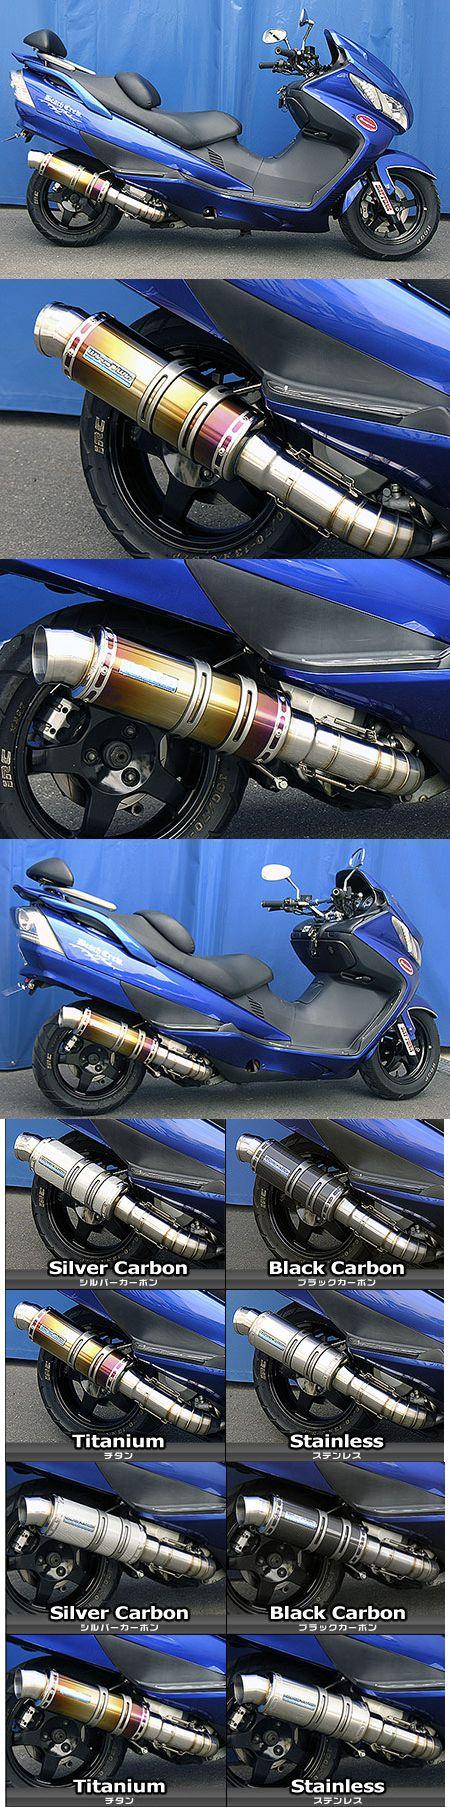 Premium全段排氣管 鈦合金款式 附觸媒 (排氣淨化觸媒)